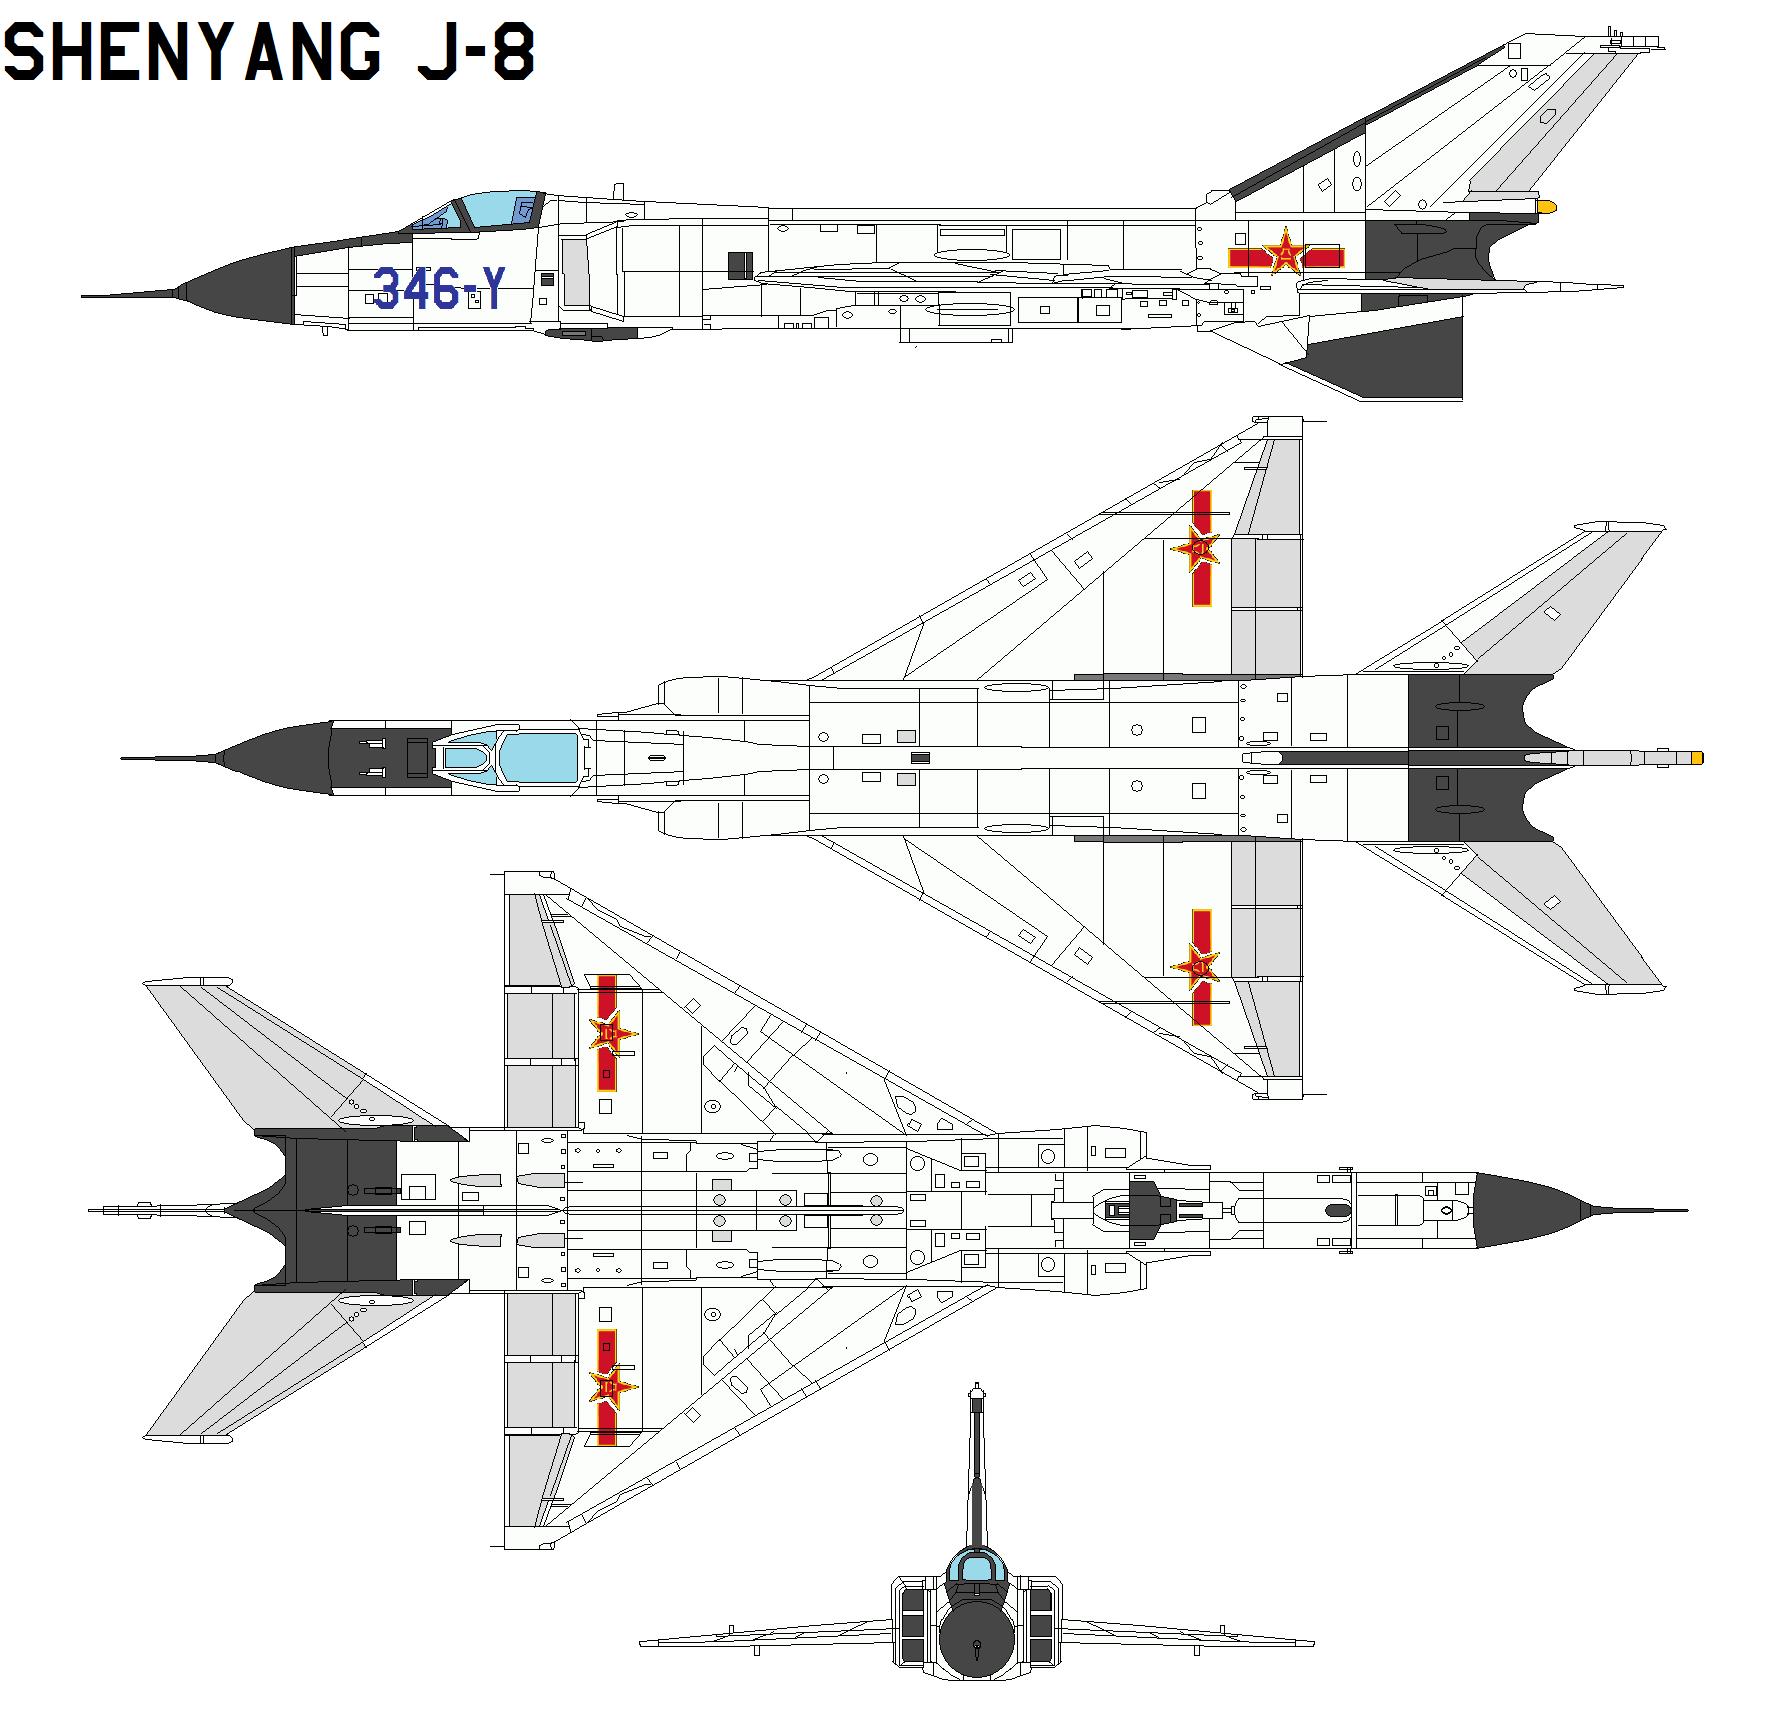 Chasseurs chinois - Page 3 ShenyangJ-8